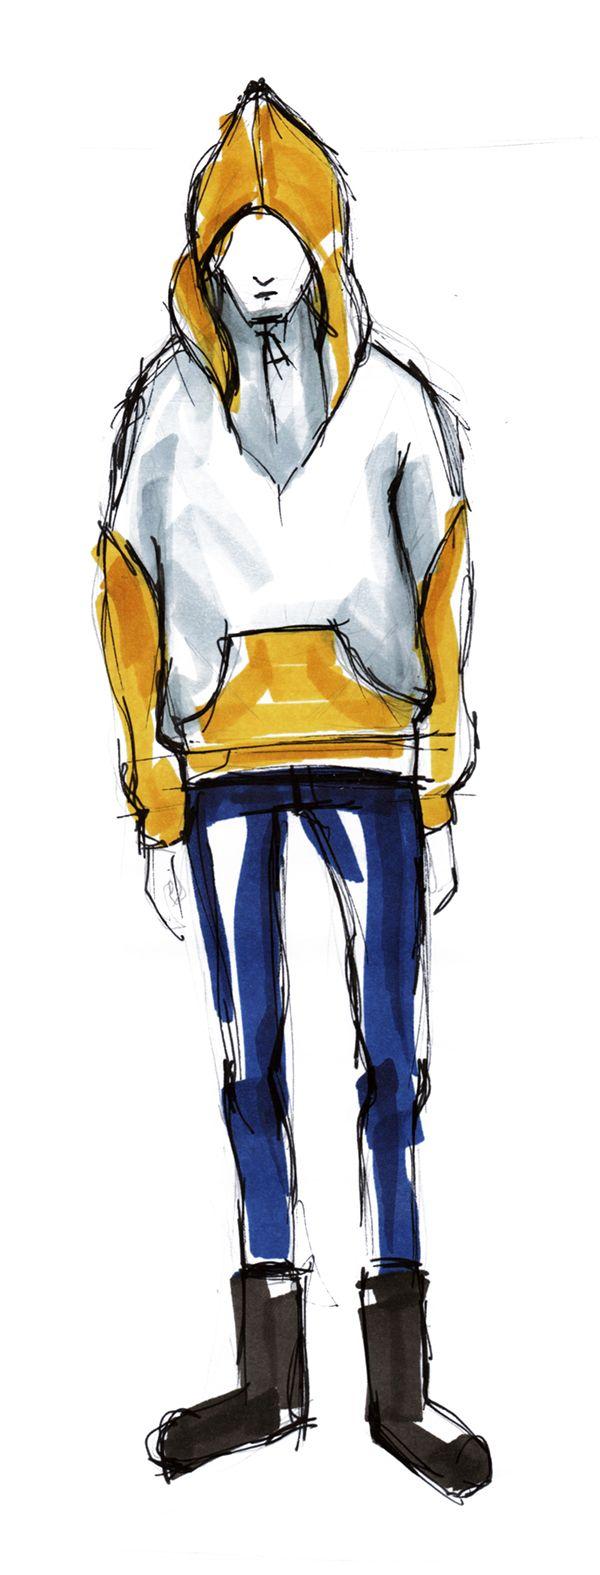 Remembranzas de Pichilemu · Fashion book collection on Behance